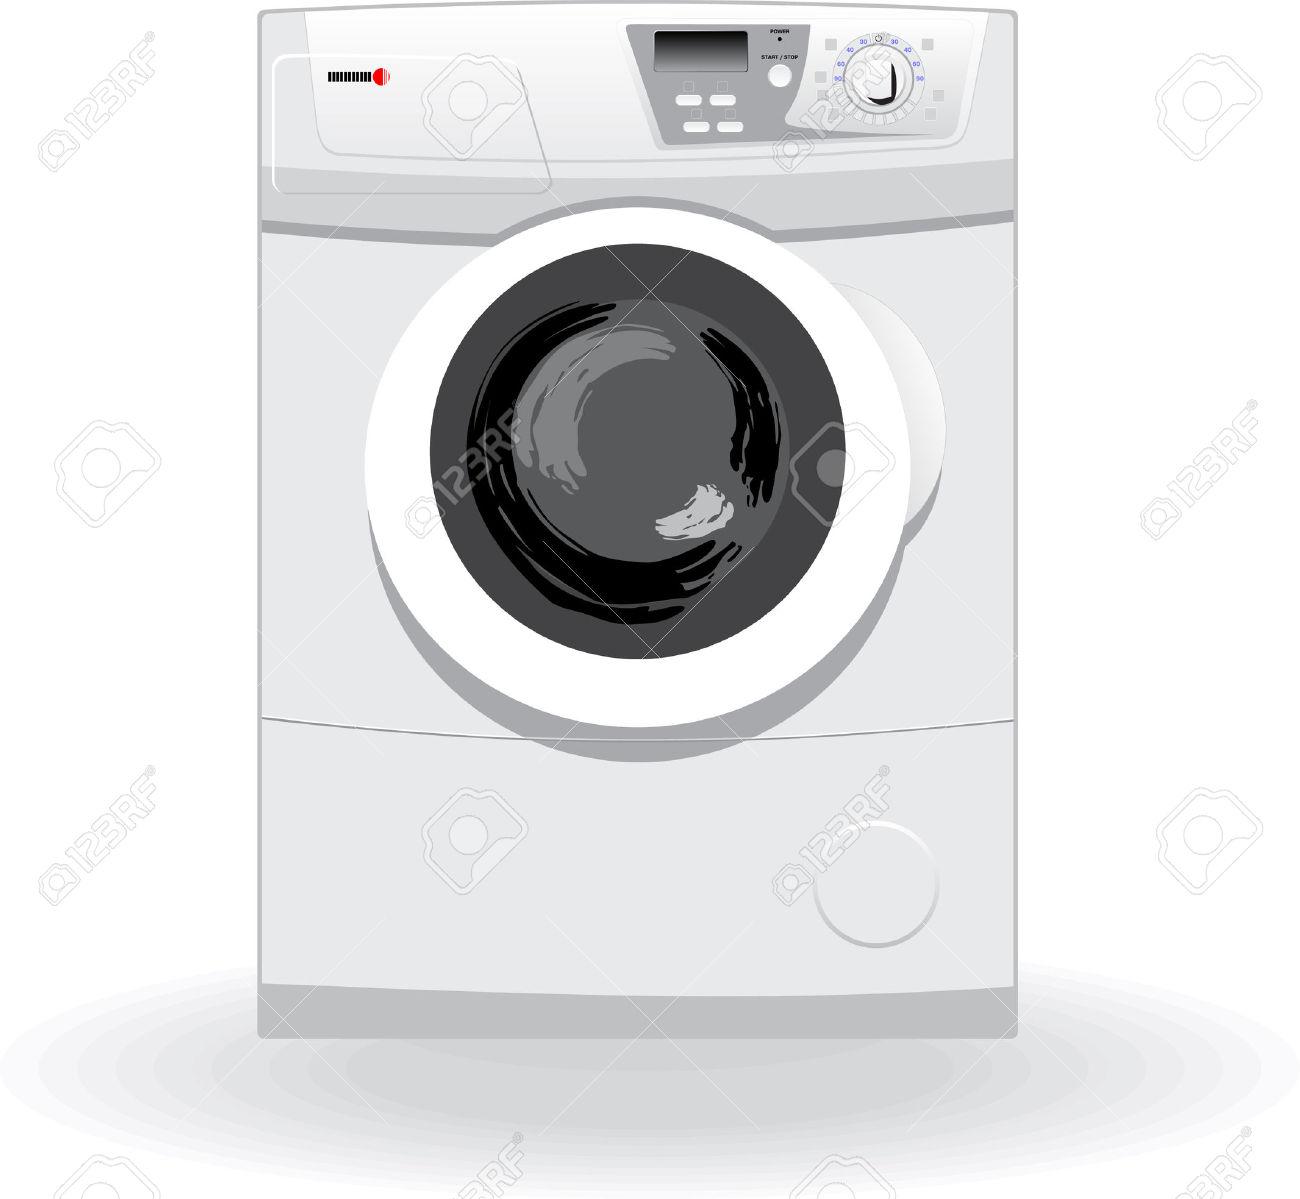 Washing Machine Vector Illustration Royalty Free Cliparts, Vectors.